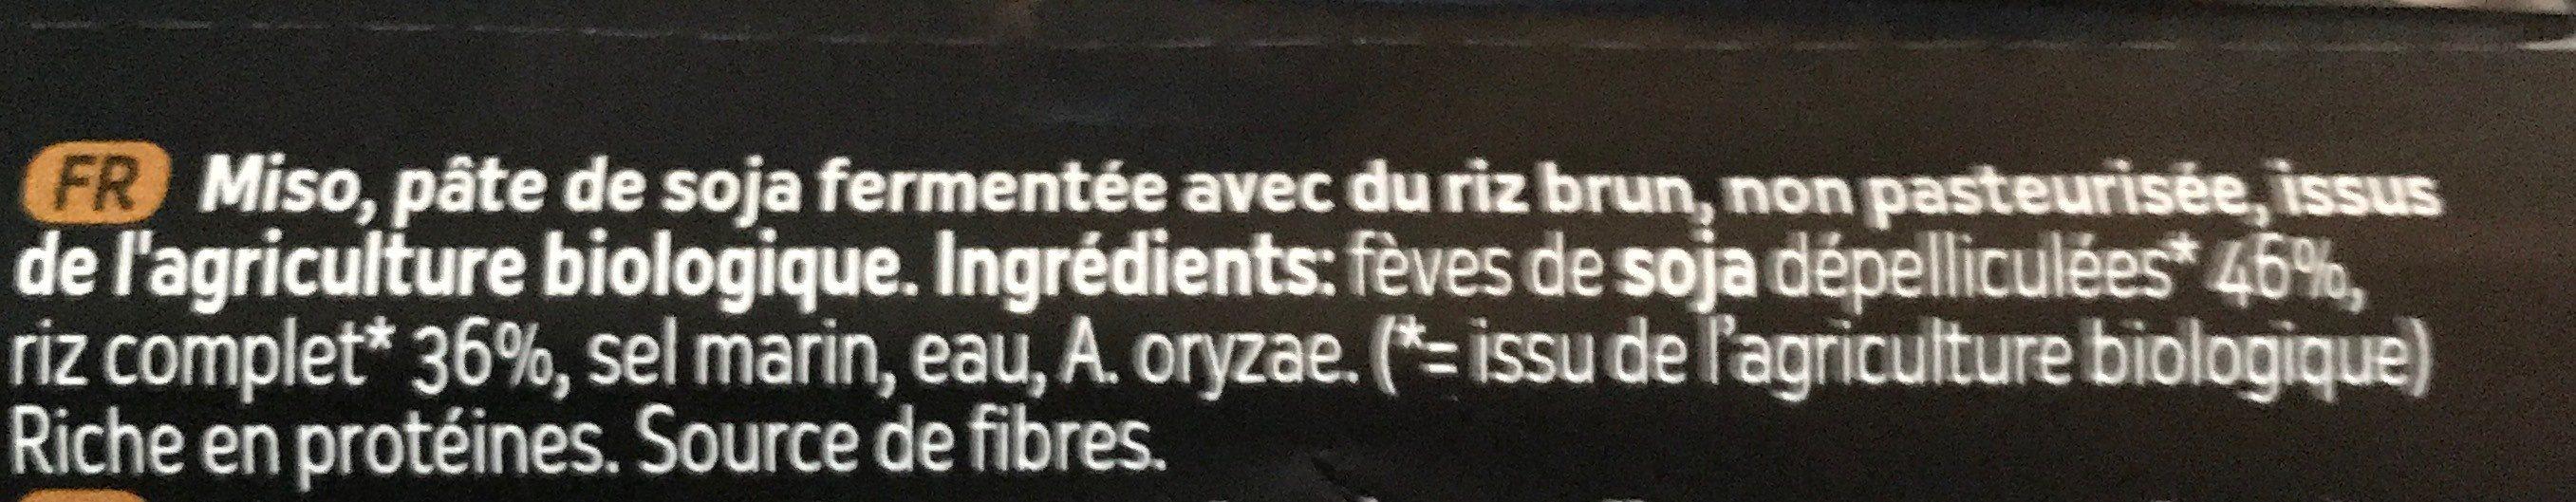 Unpasteurized brown rice miso - Ingrédients - fr